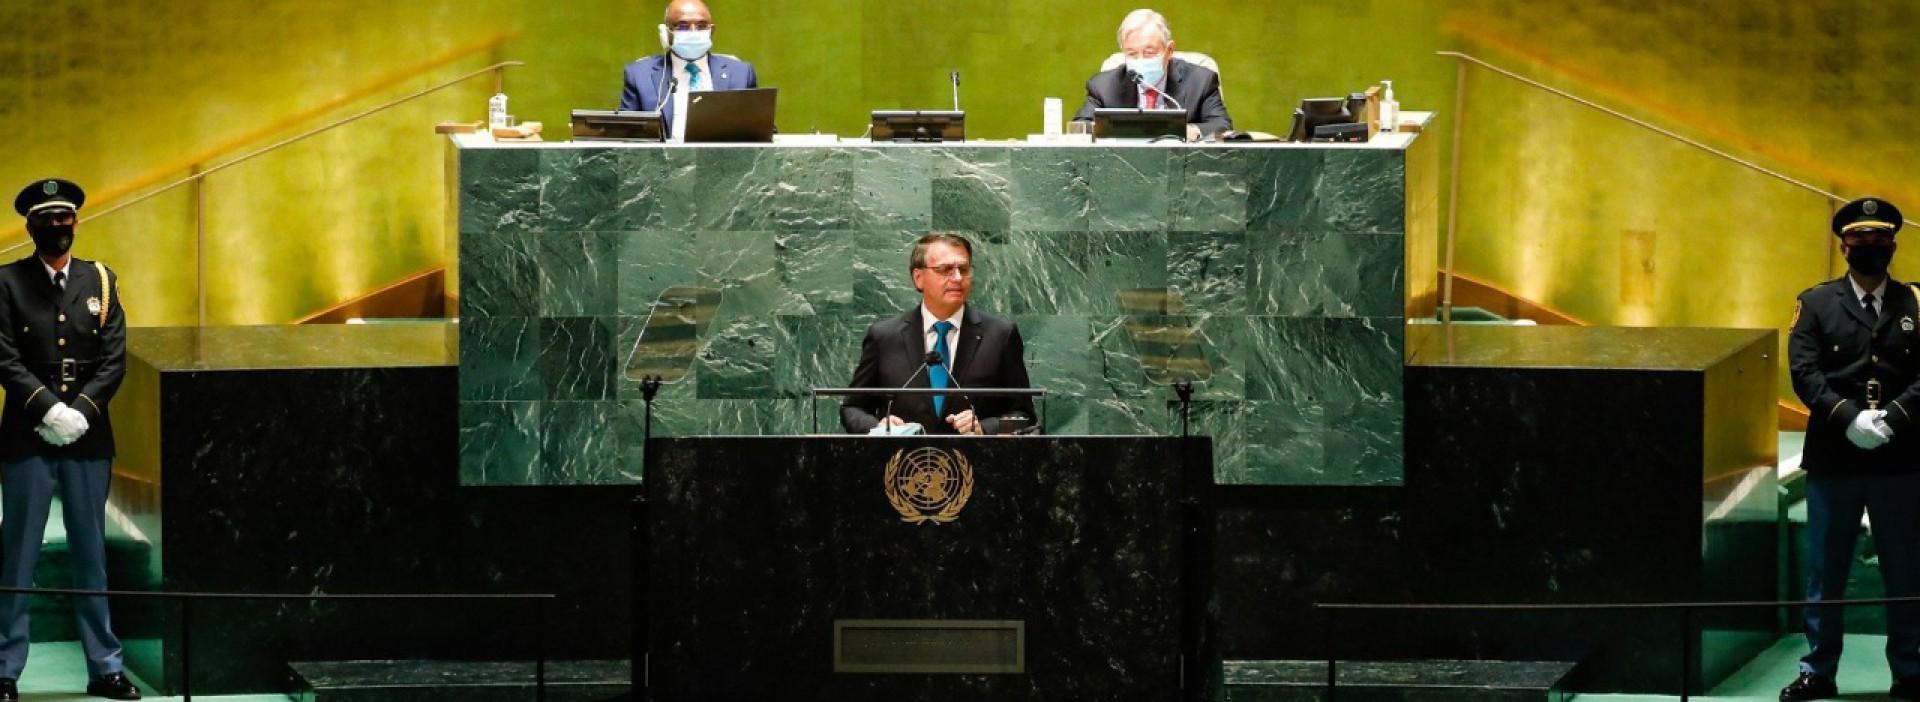 Presidente Jair Bolsonaro em dirscurso ma ONU (Foto: Alan Santos/PR)